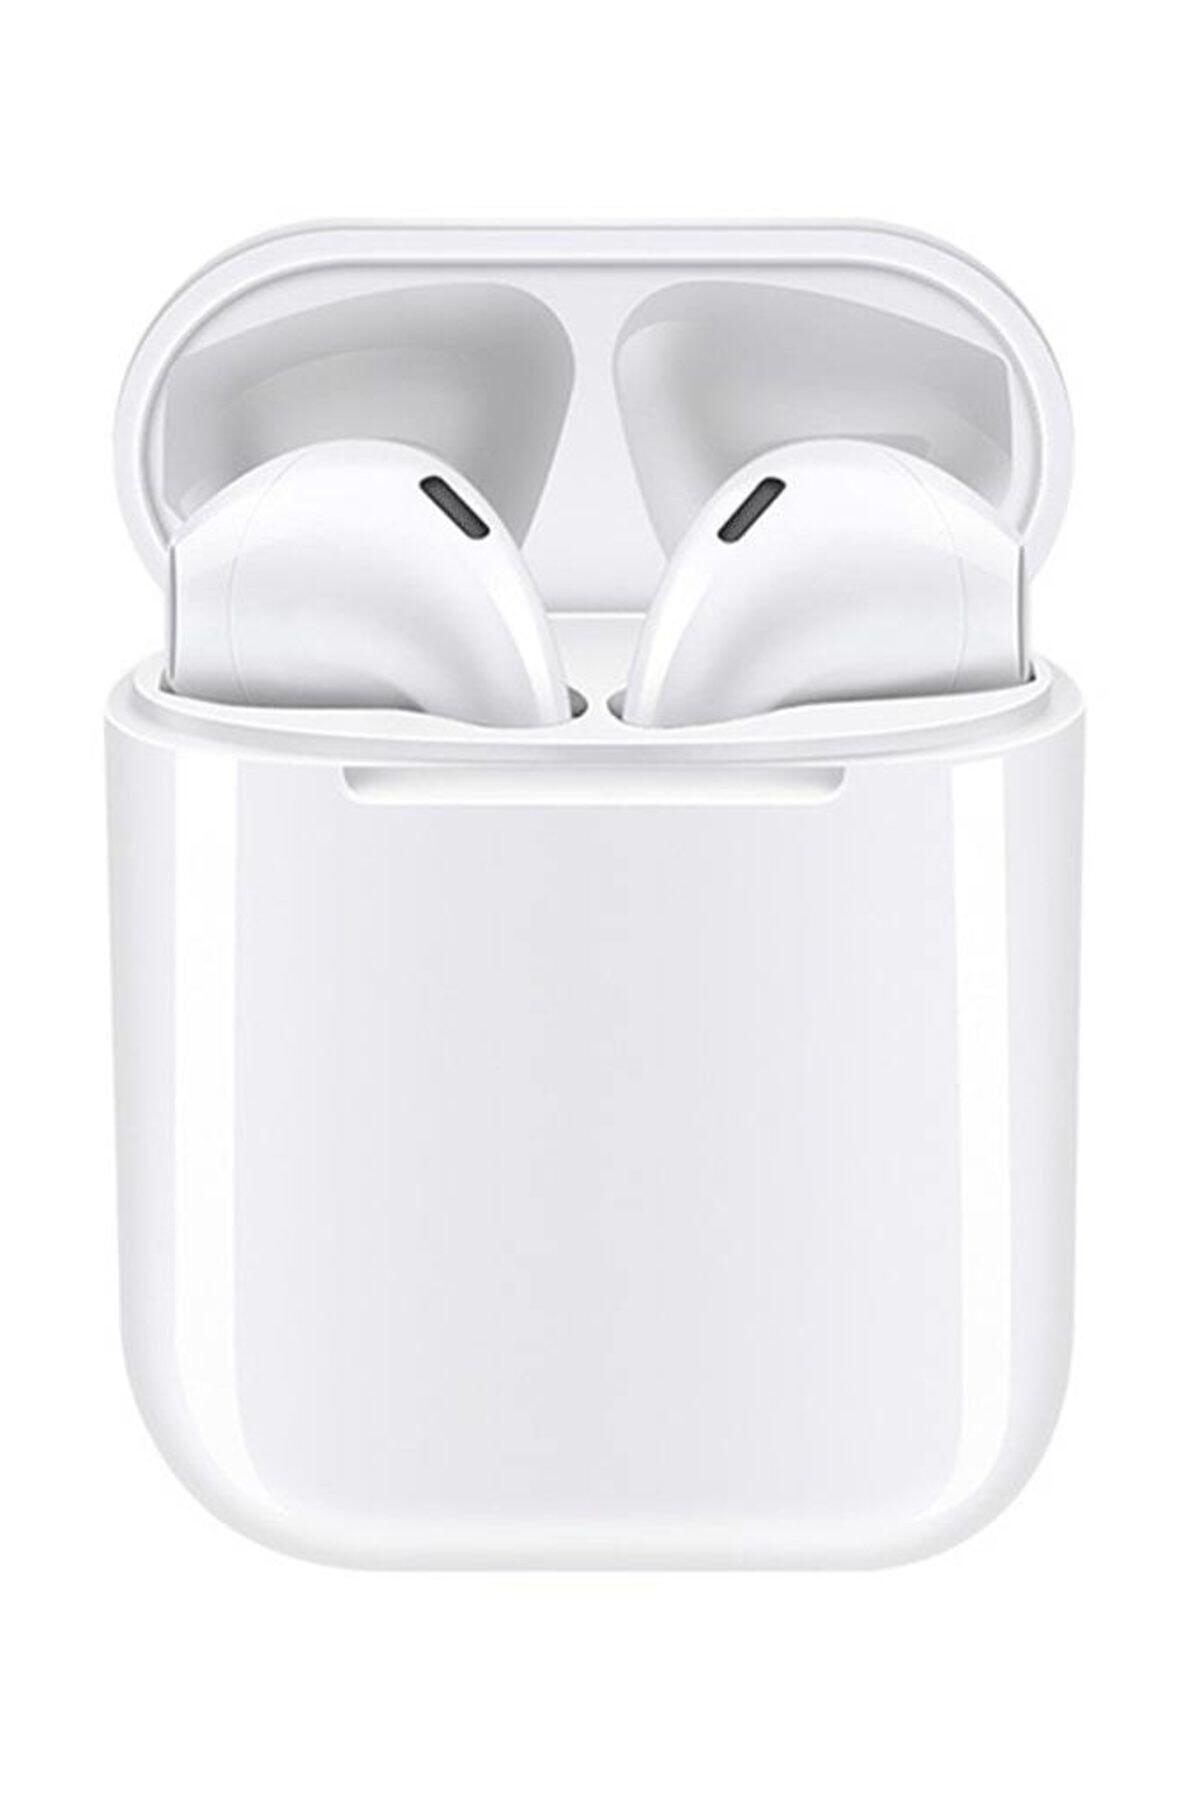 Tws Airpods I12 Beyaz Iphone Android Universal Bluetooth Kulaklık Hd Ses Kalitesi 1